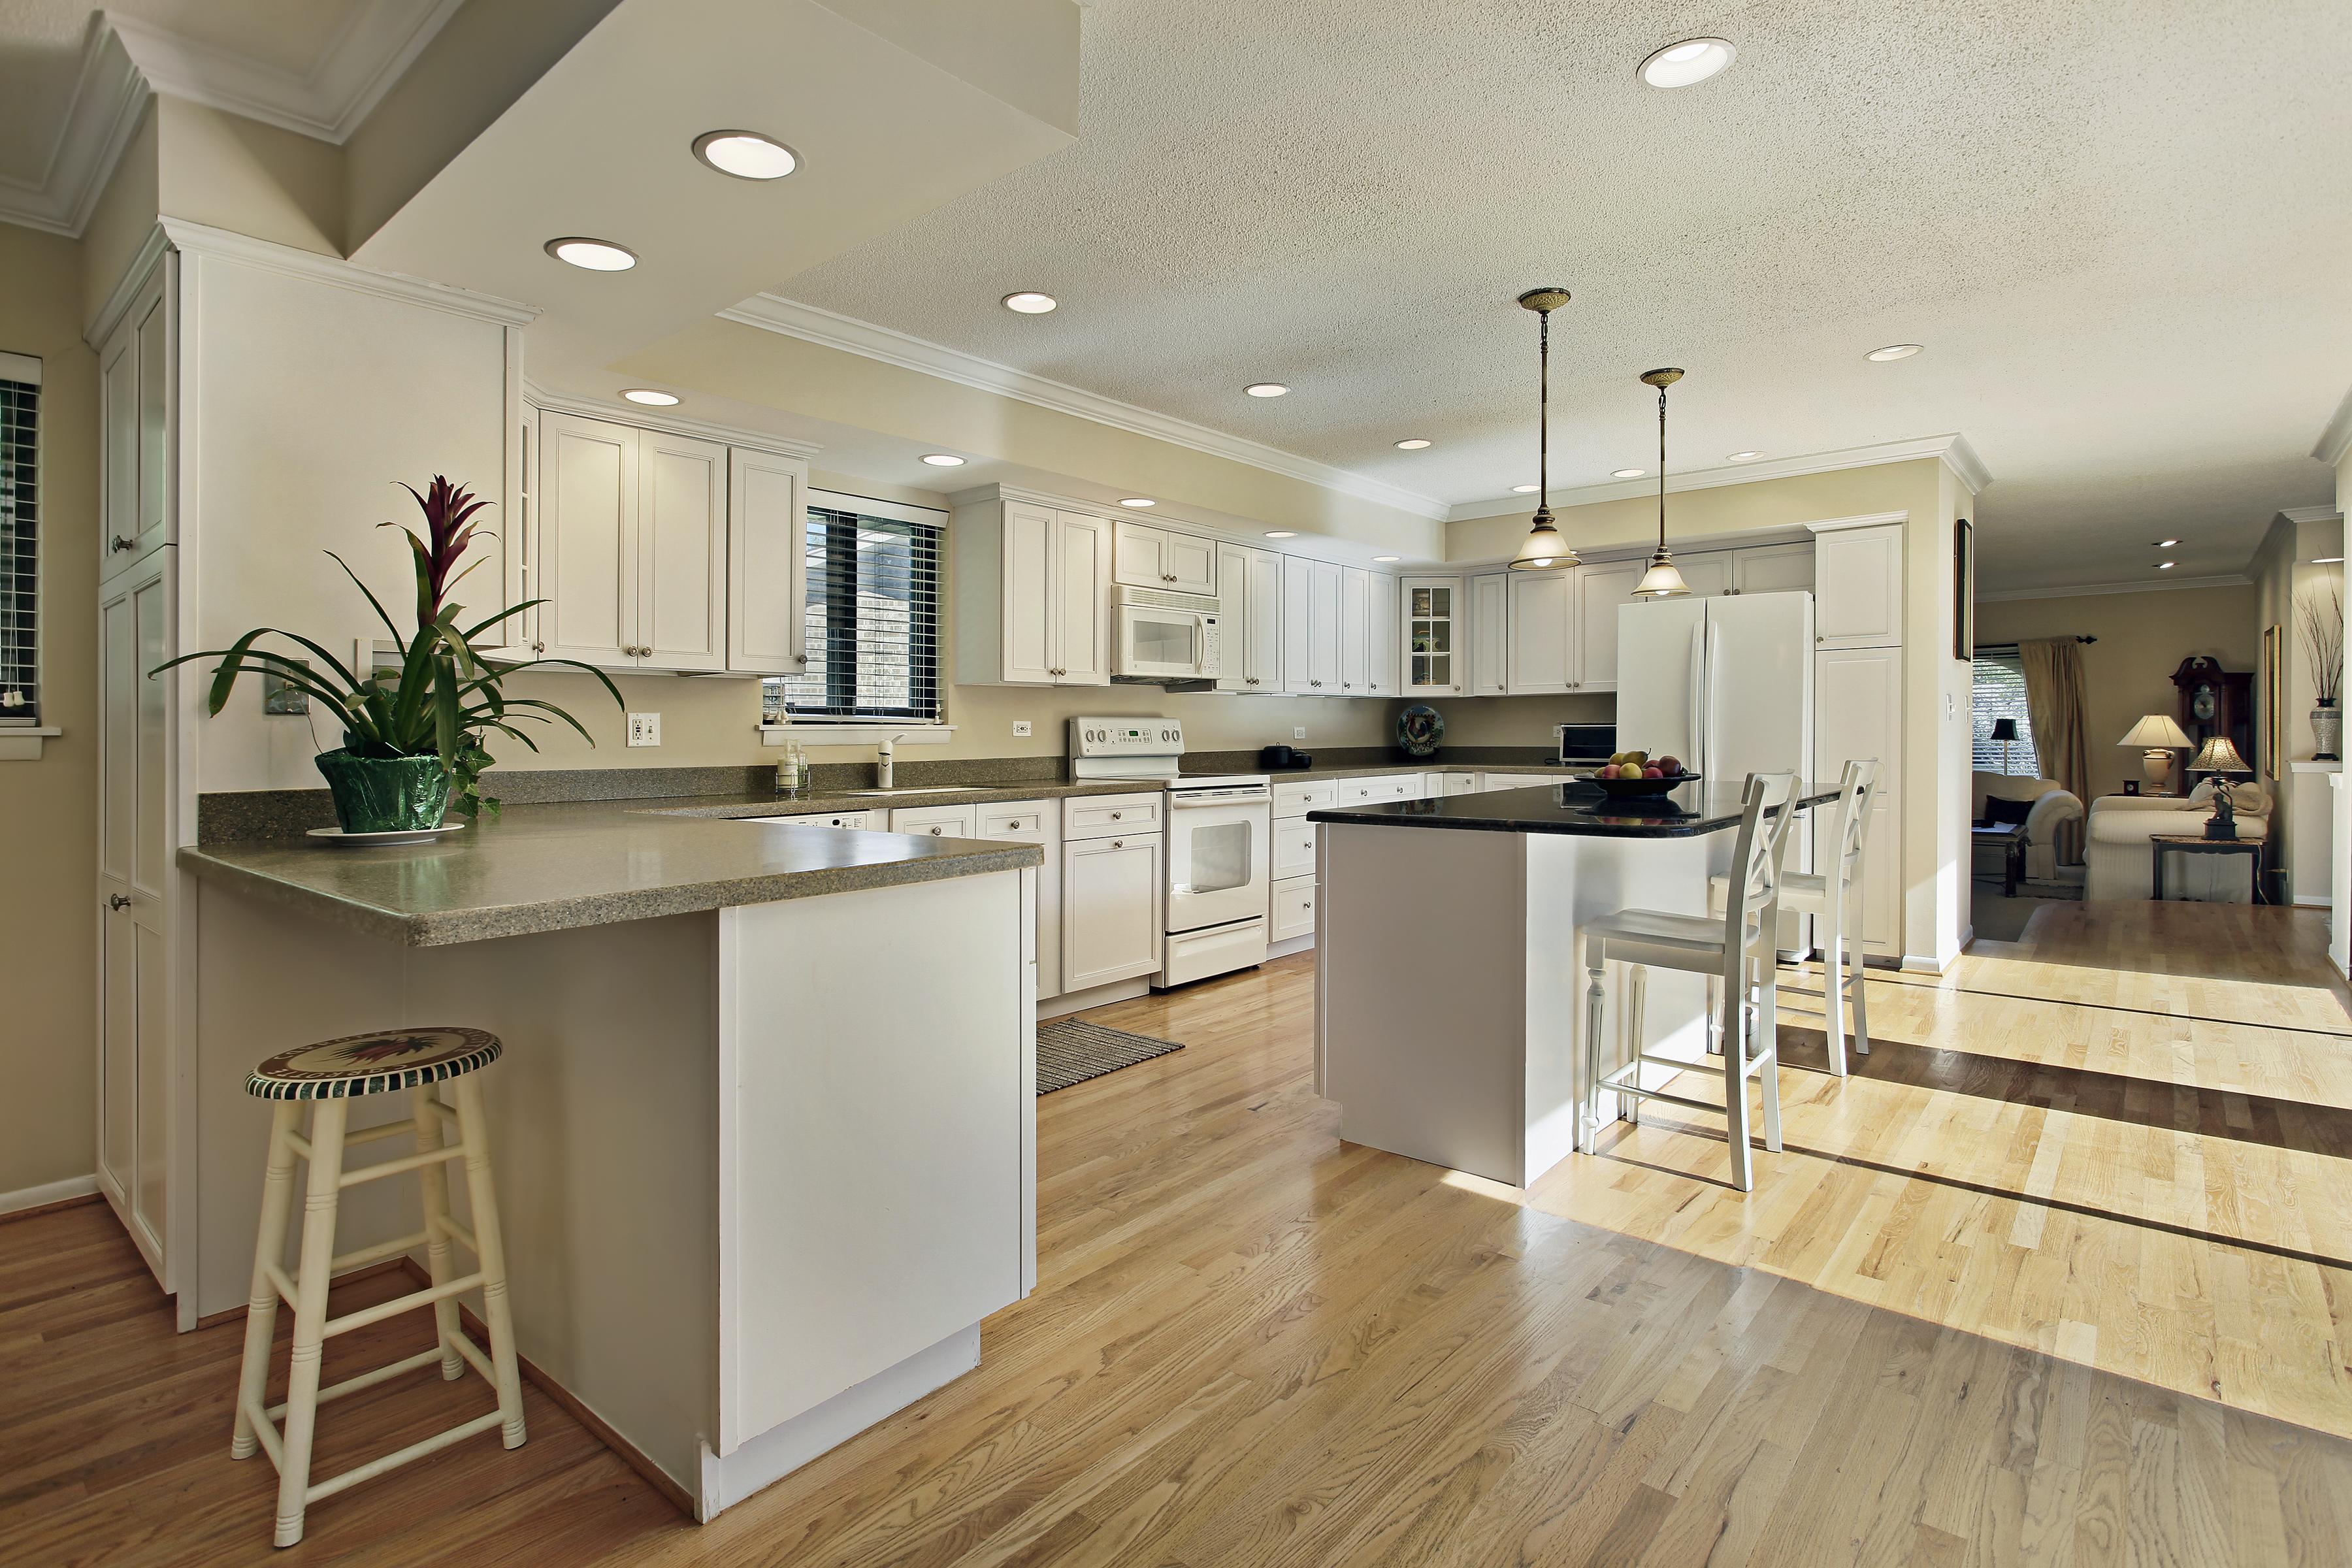 Brilliant Wood Floor In Kitchen 25 With Hardwood Wooden Pro with regard to measurements 3600 X 2400